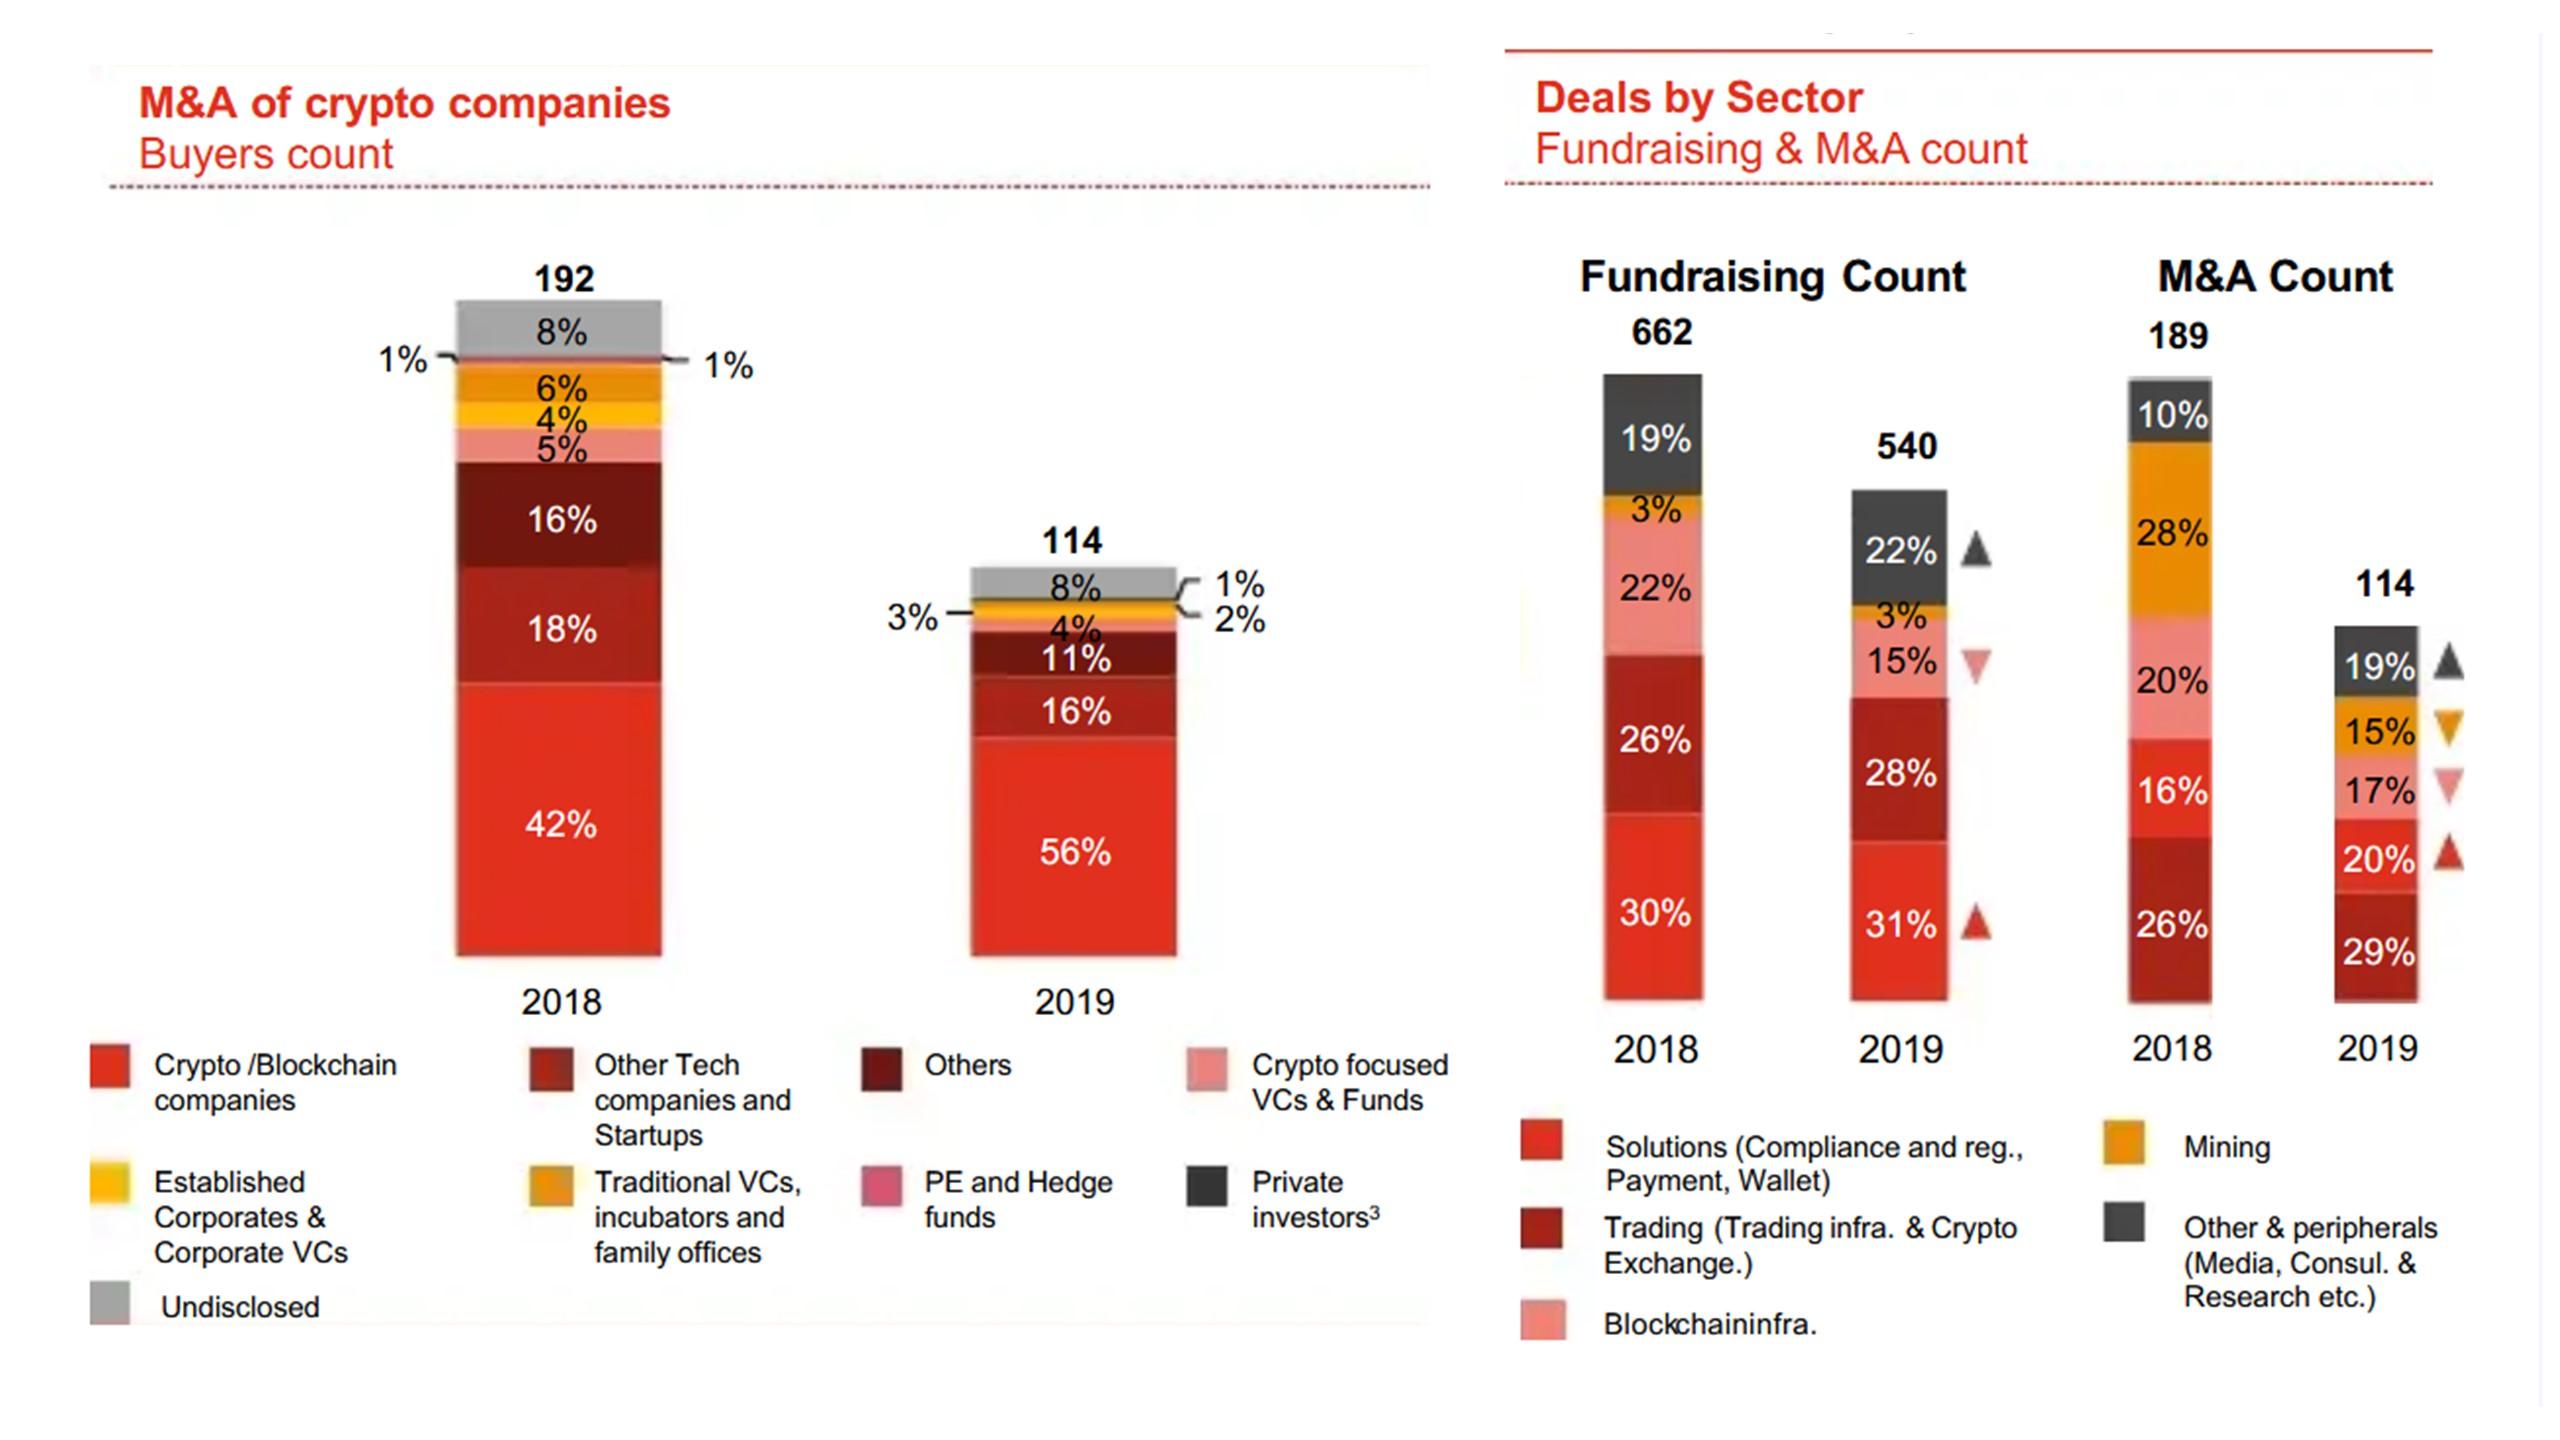 Pwc-Blockchain-bubble-types-of-deals-2019